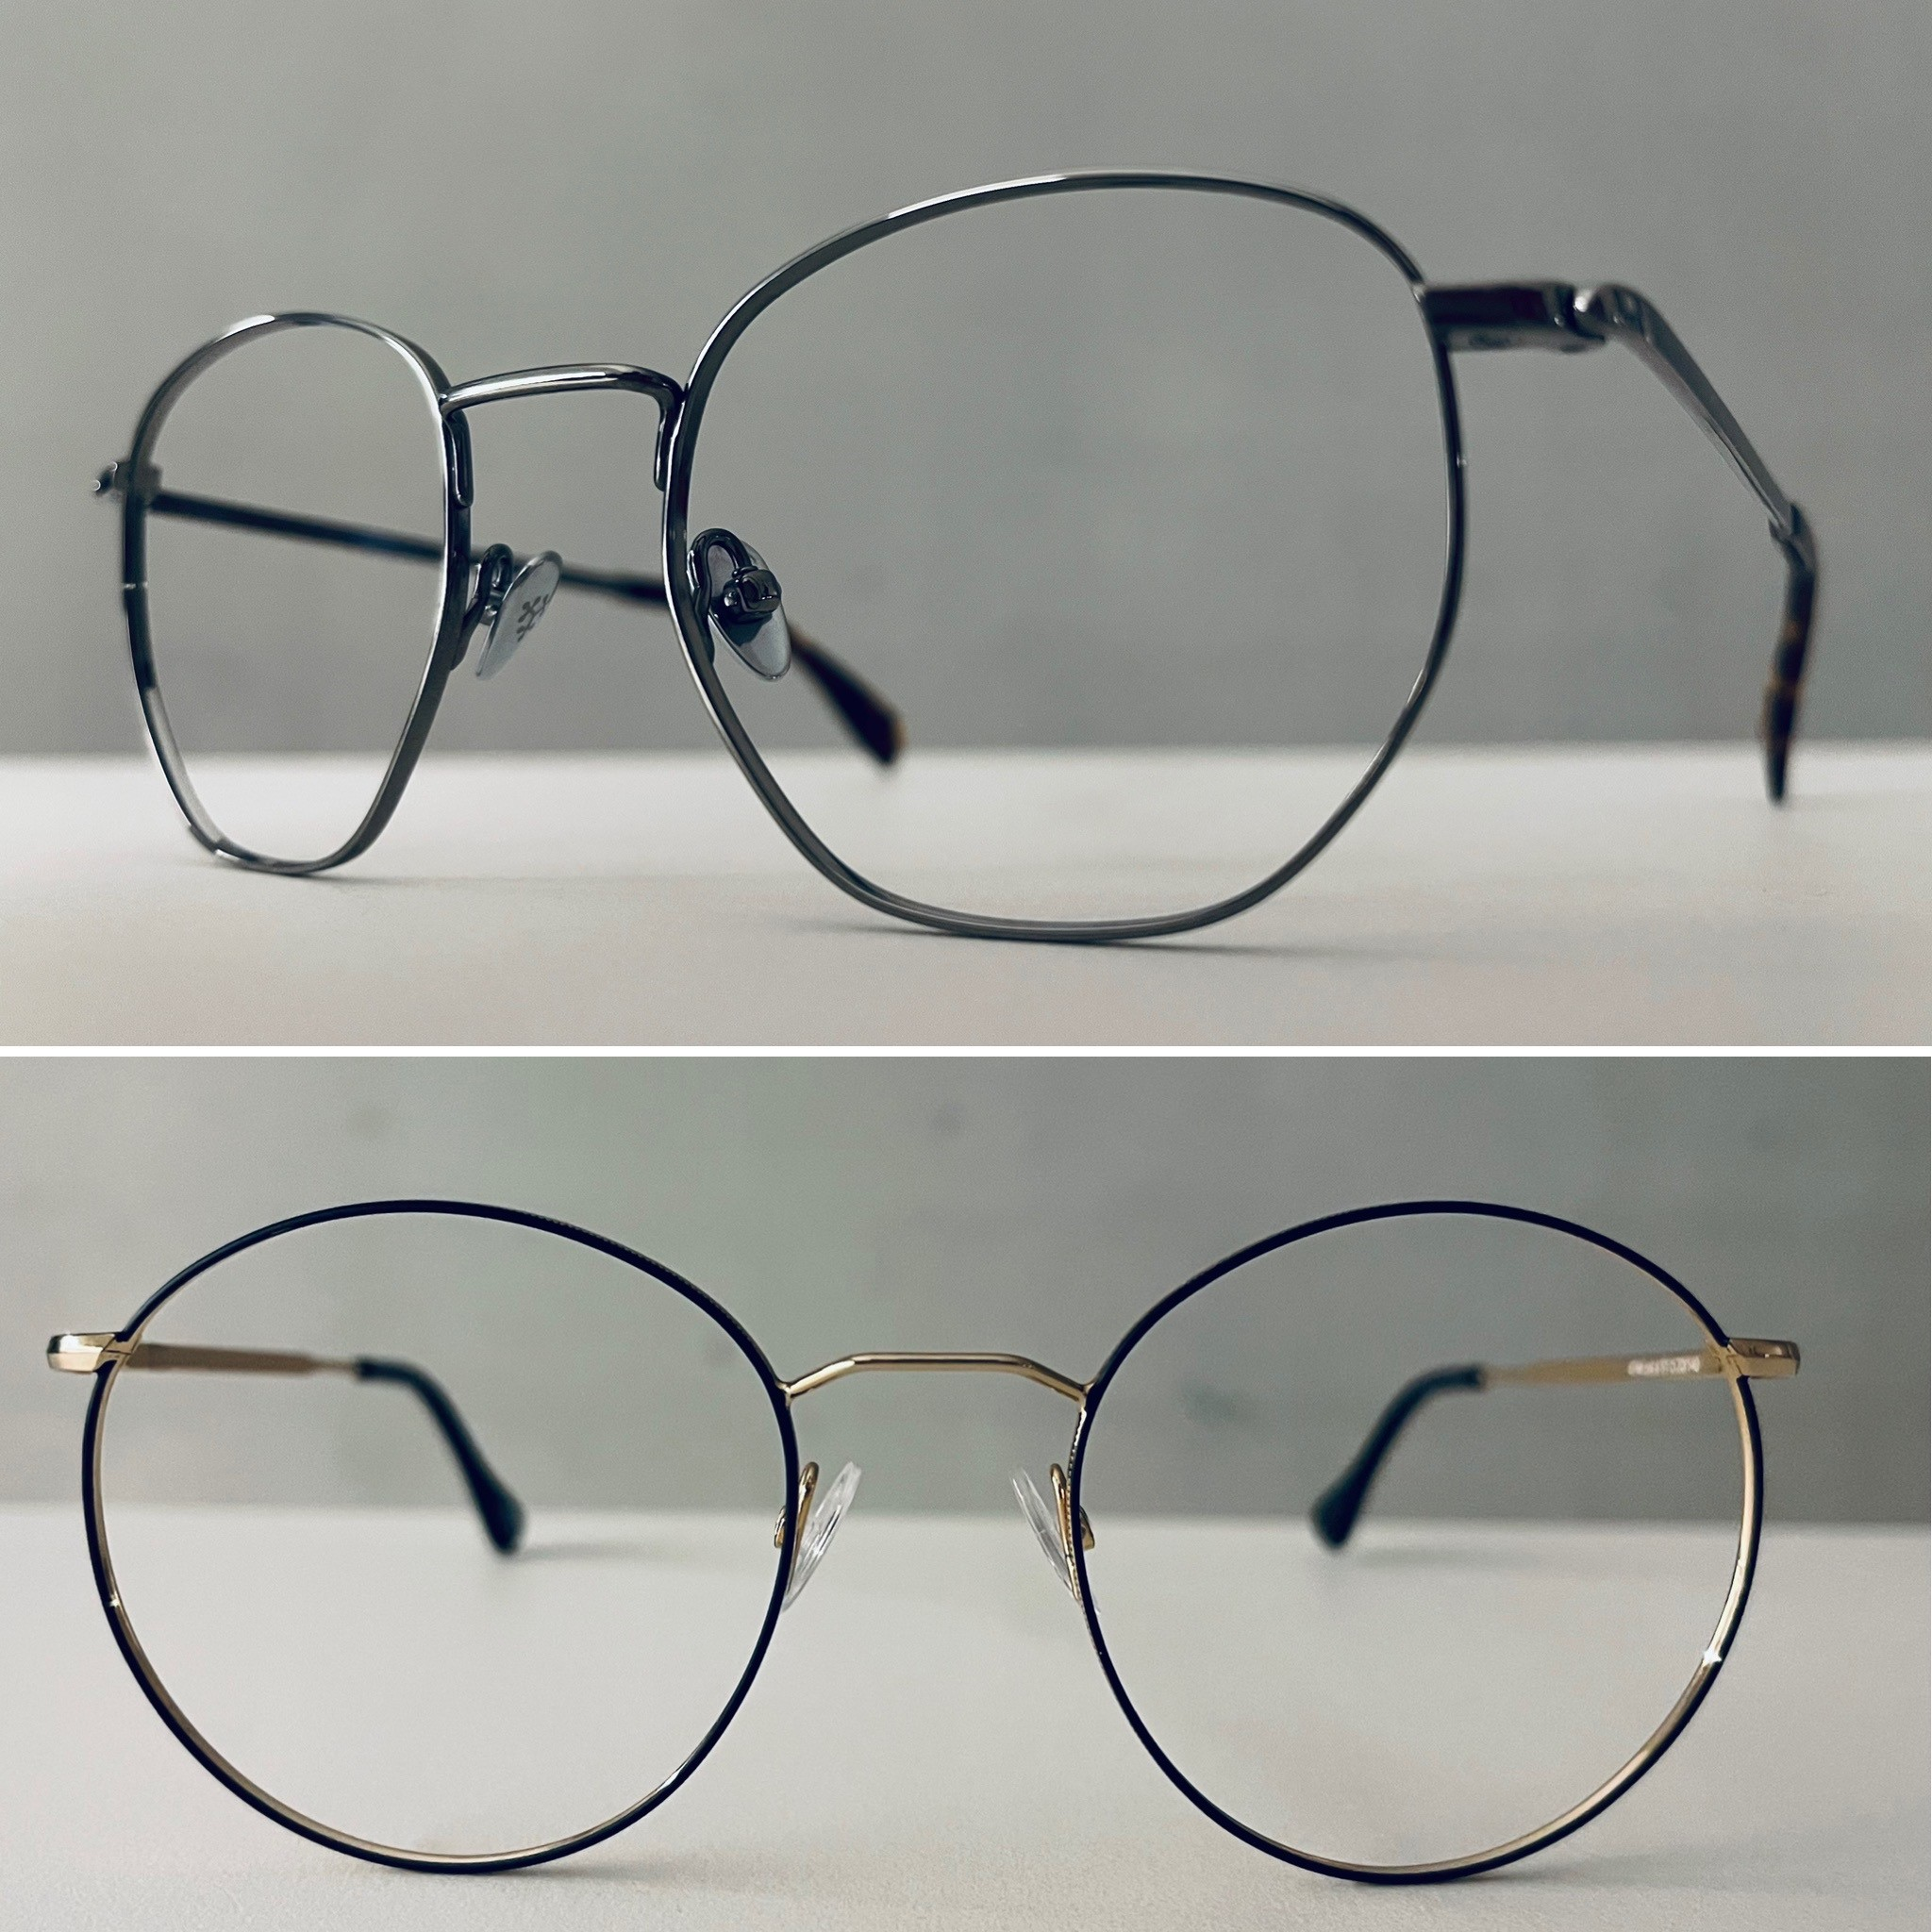 BLOG Trends 2021 Optiker Augensache Friedberg Schildpatt by Optiker Augensache Brille Sonnenbrille Kontaktlinse Friedberg_ultraslim